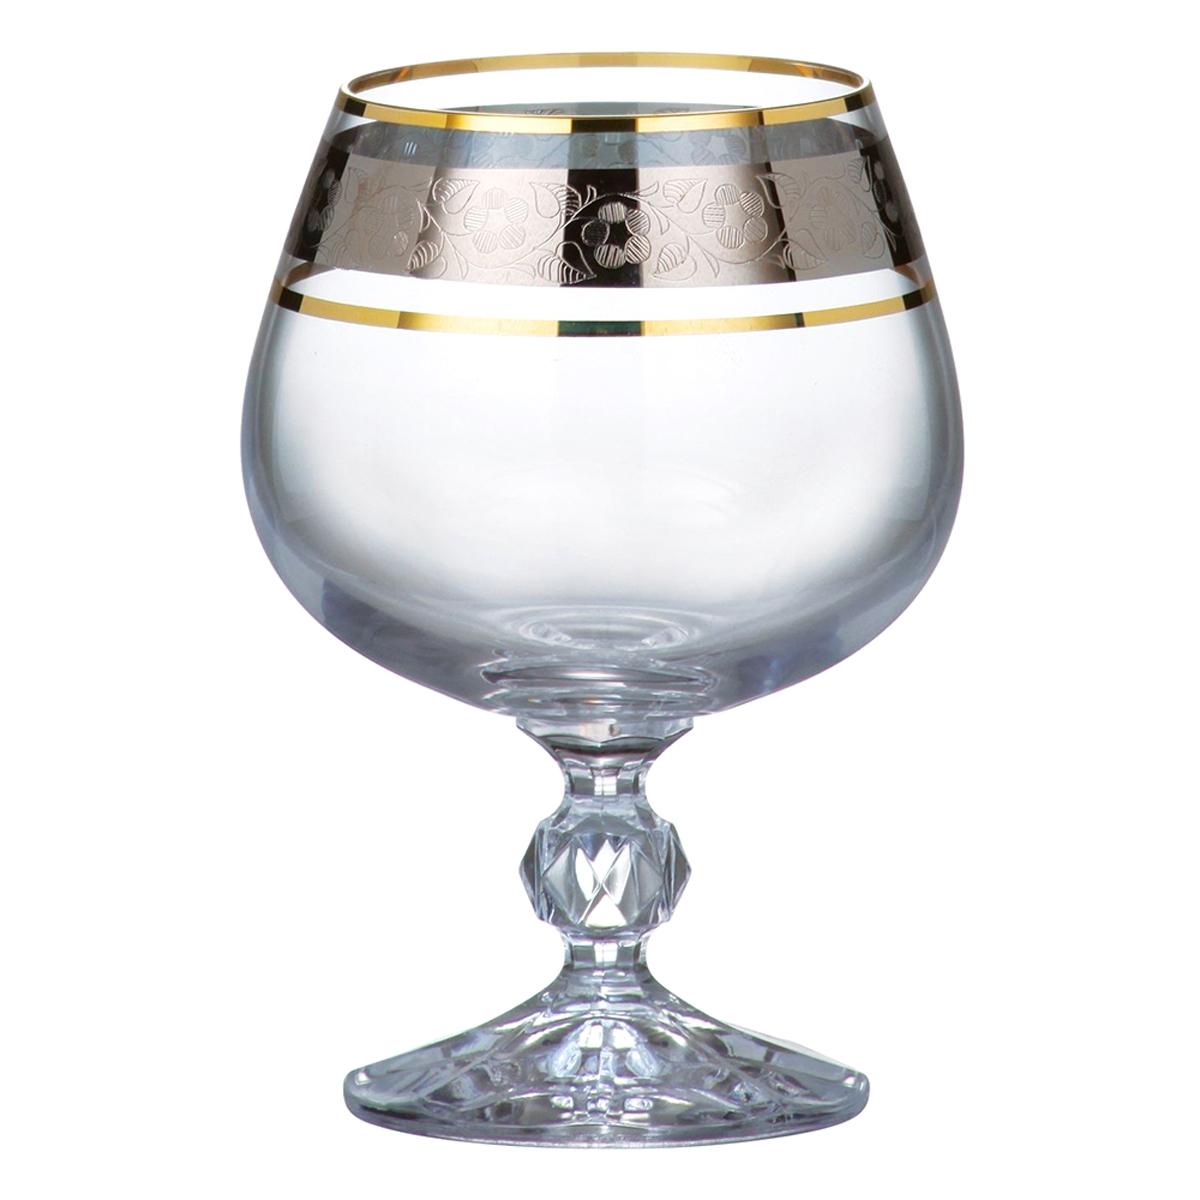 Набор бокалов для бренди Bohemia Crystal Клаудия, 250 мл, 6 шт. 40149/43249/250 набор фужеров 180мл 6шт клаудия 43249